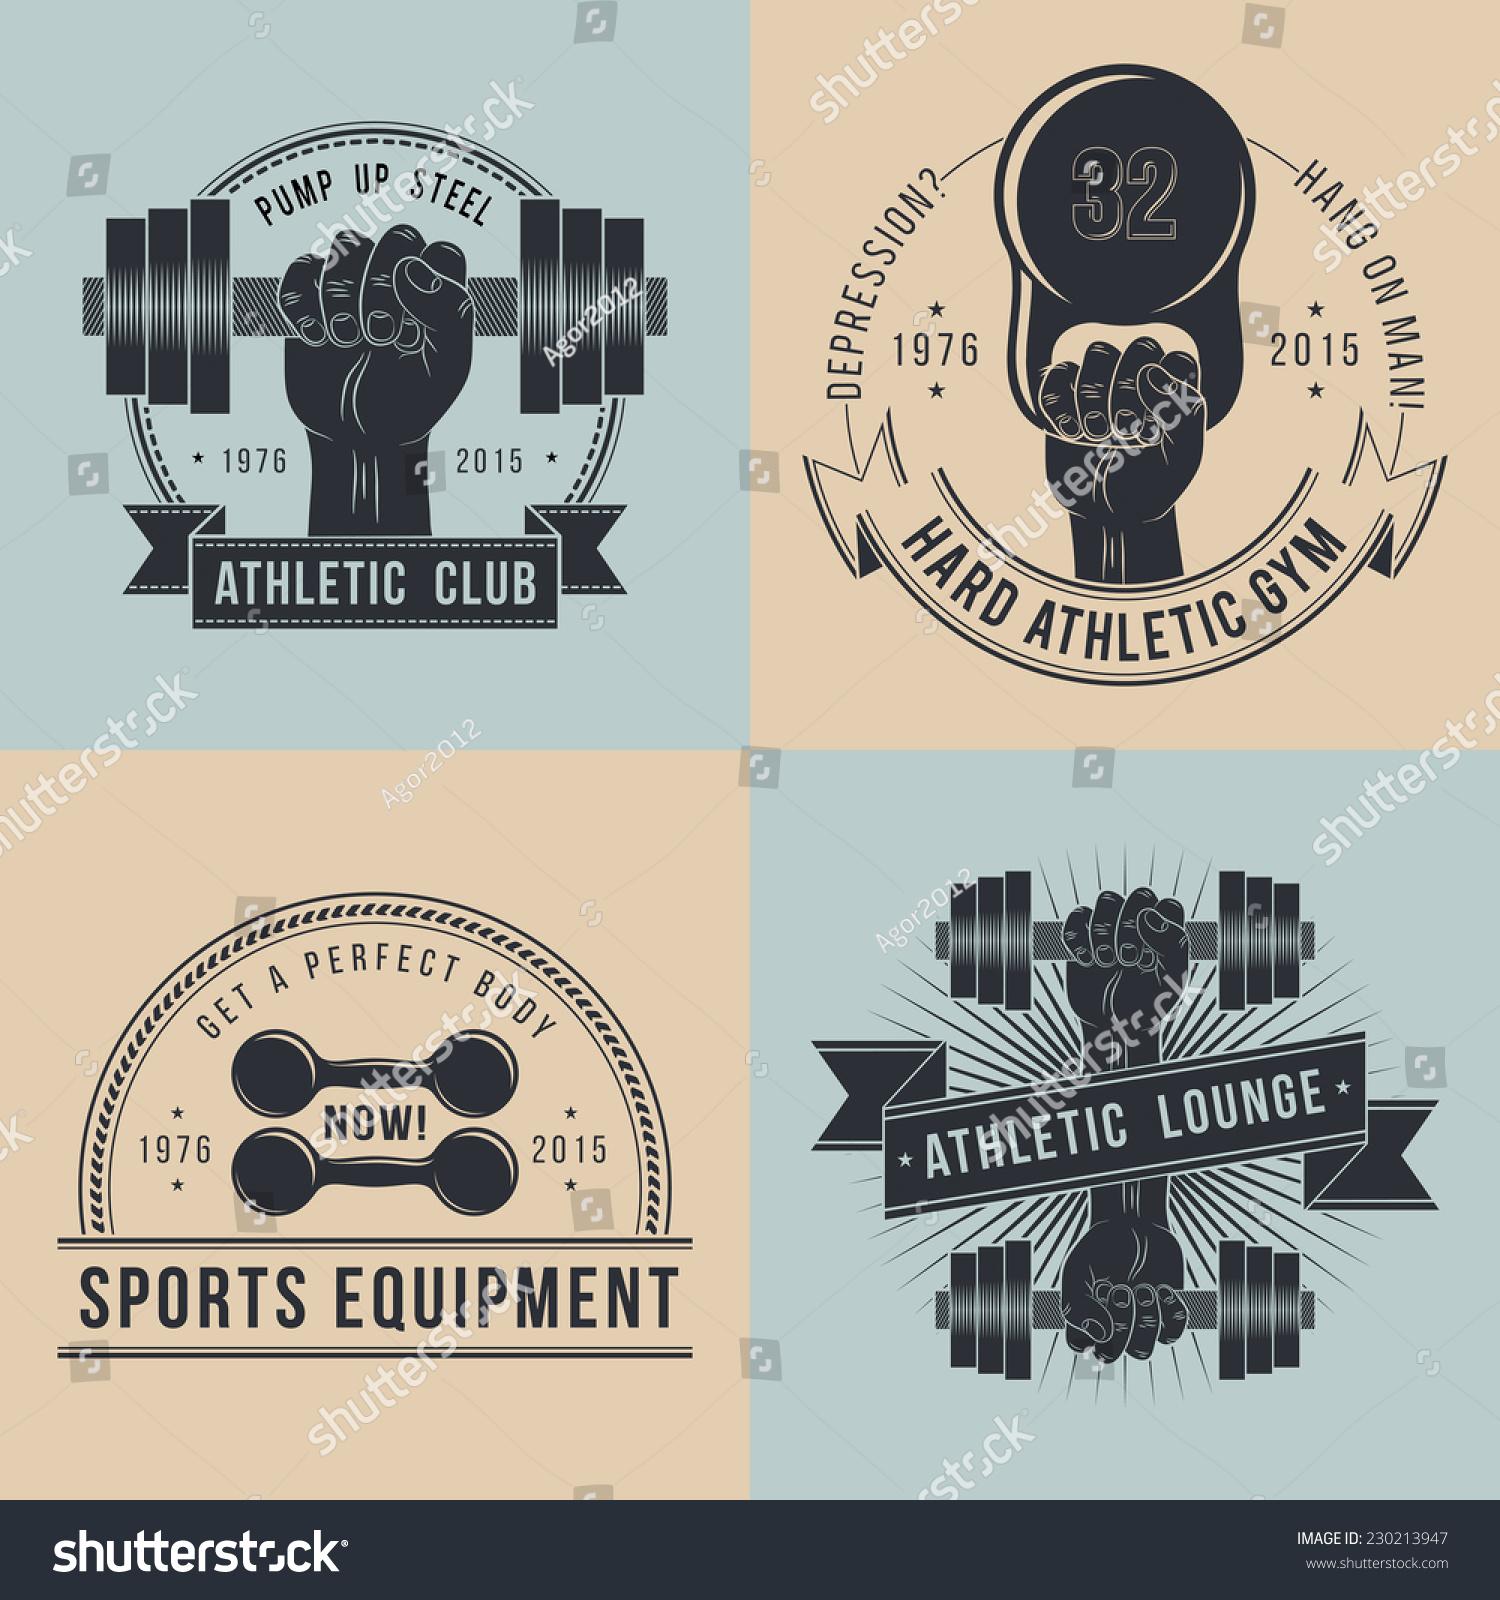 Gym Equipment Logo: Hand Dumbbells Logos Sport Athletic Club Stock Vector